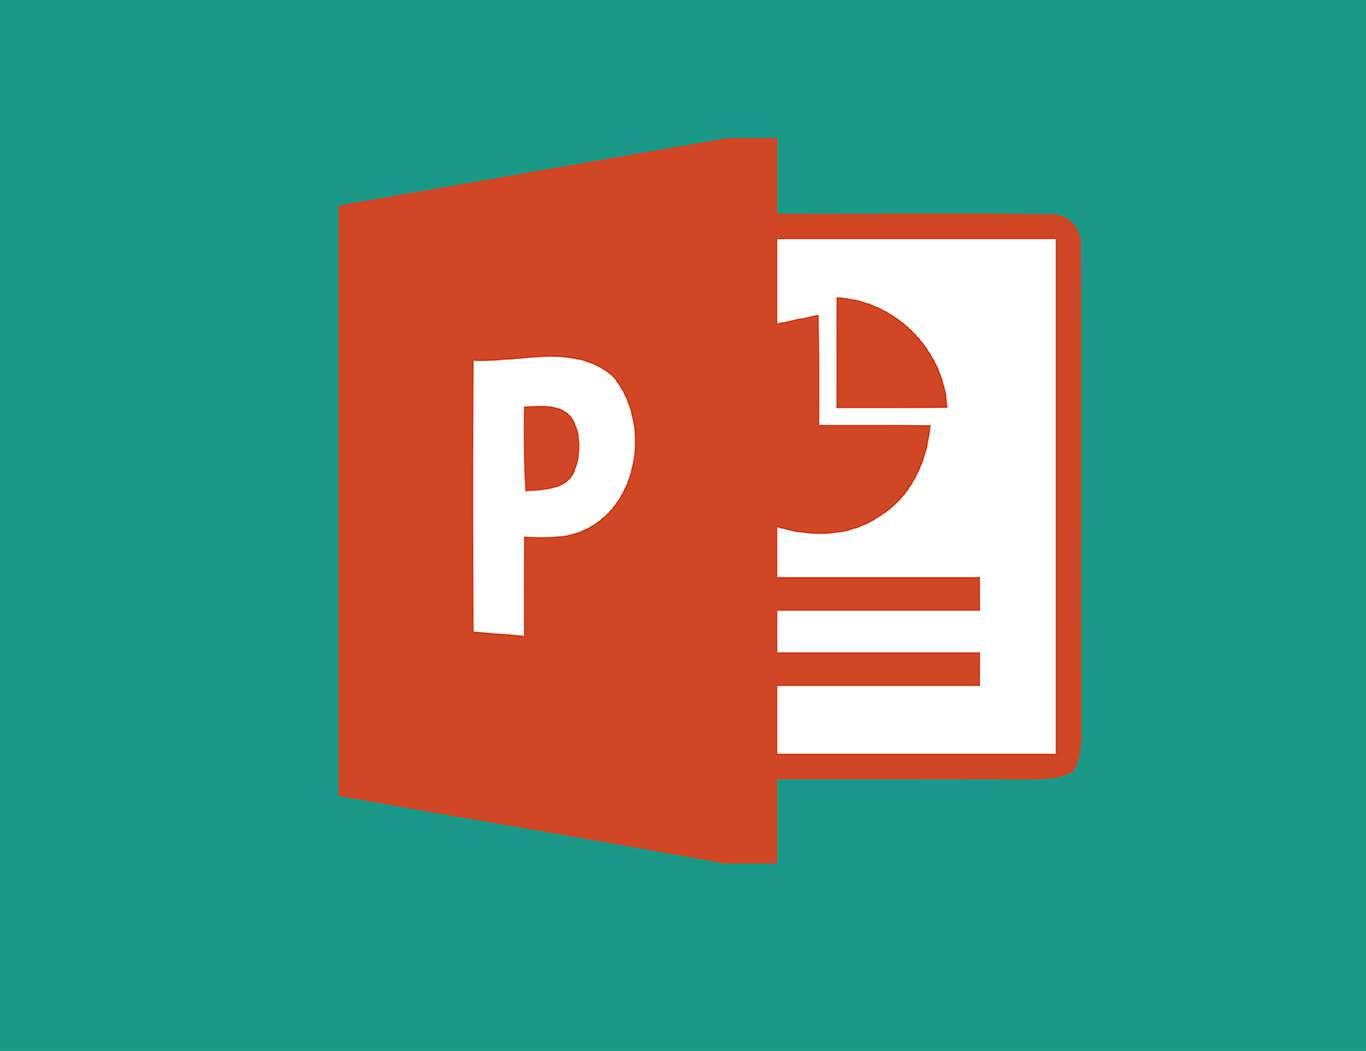 post memilih desain powerpoint jasa powerpoint jasa presentasi jasa desain ppt_compressed